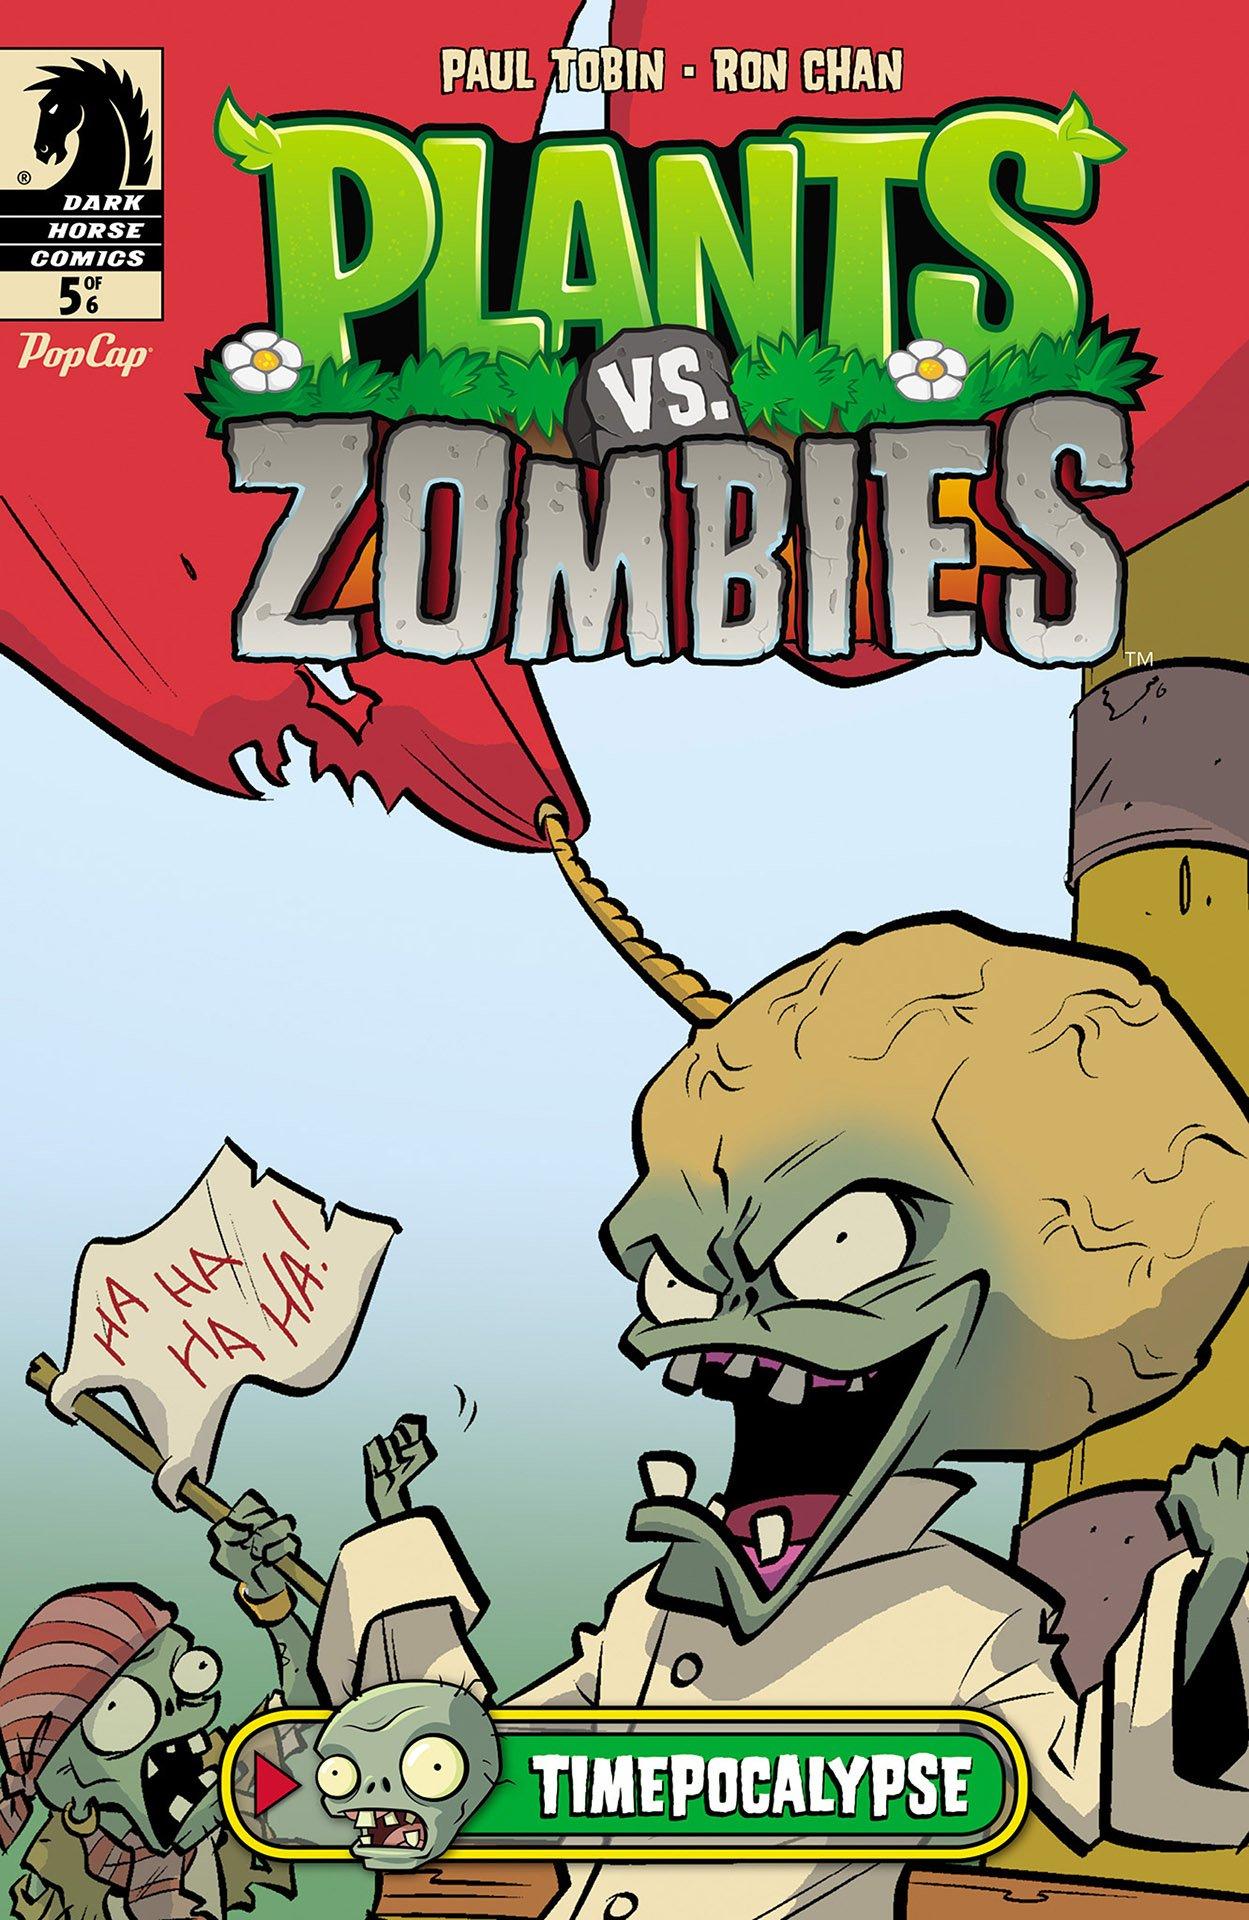 Plants vs. Zombies - Timepocalypse 005 (September 2014)